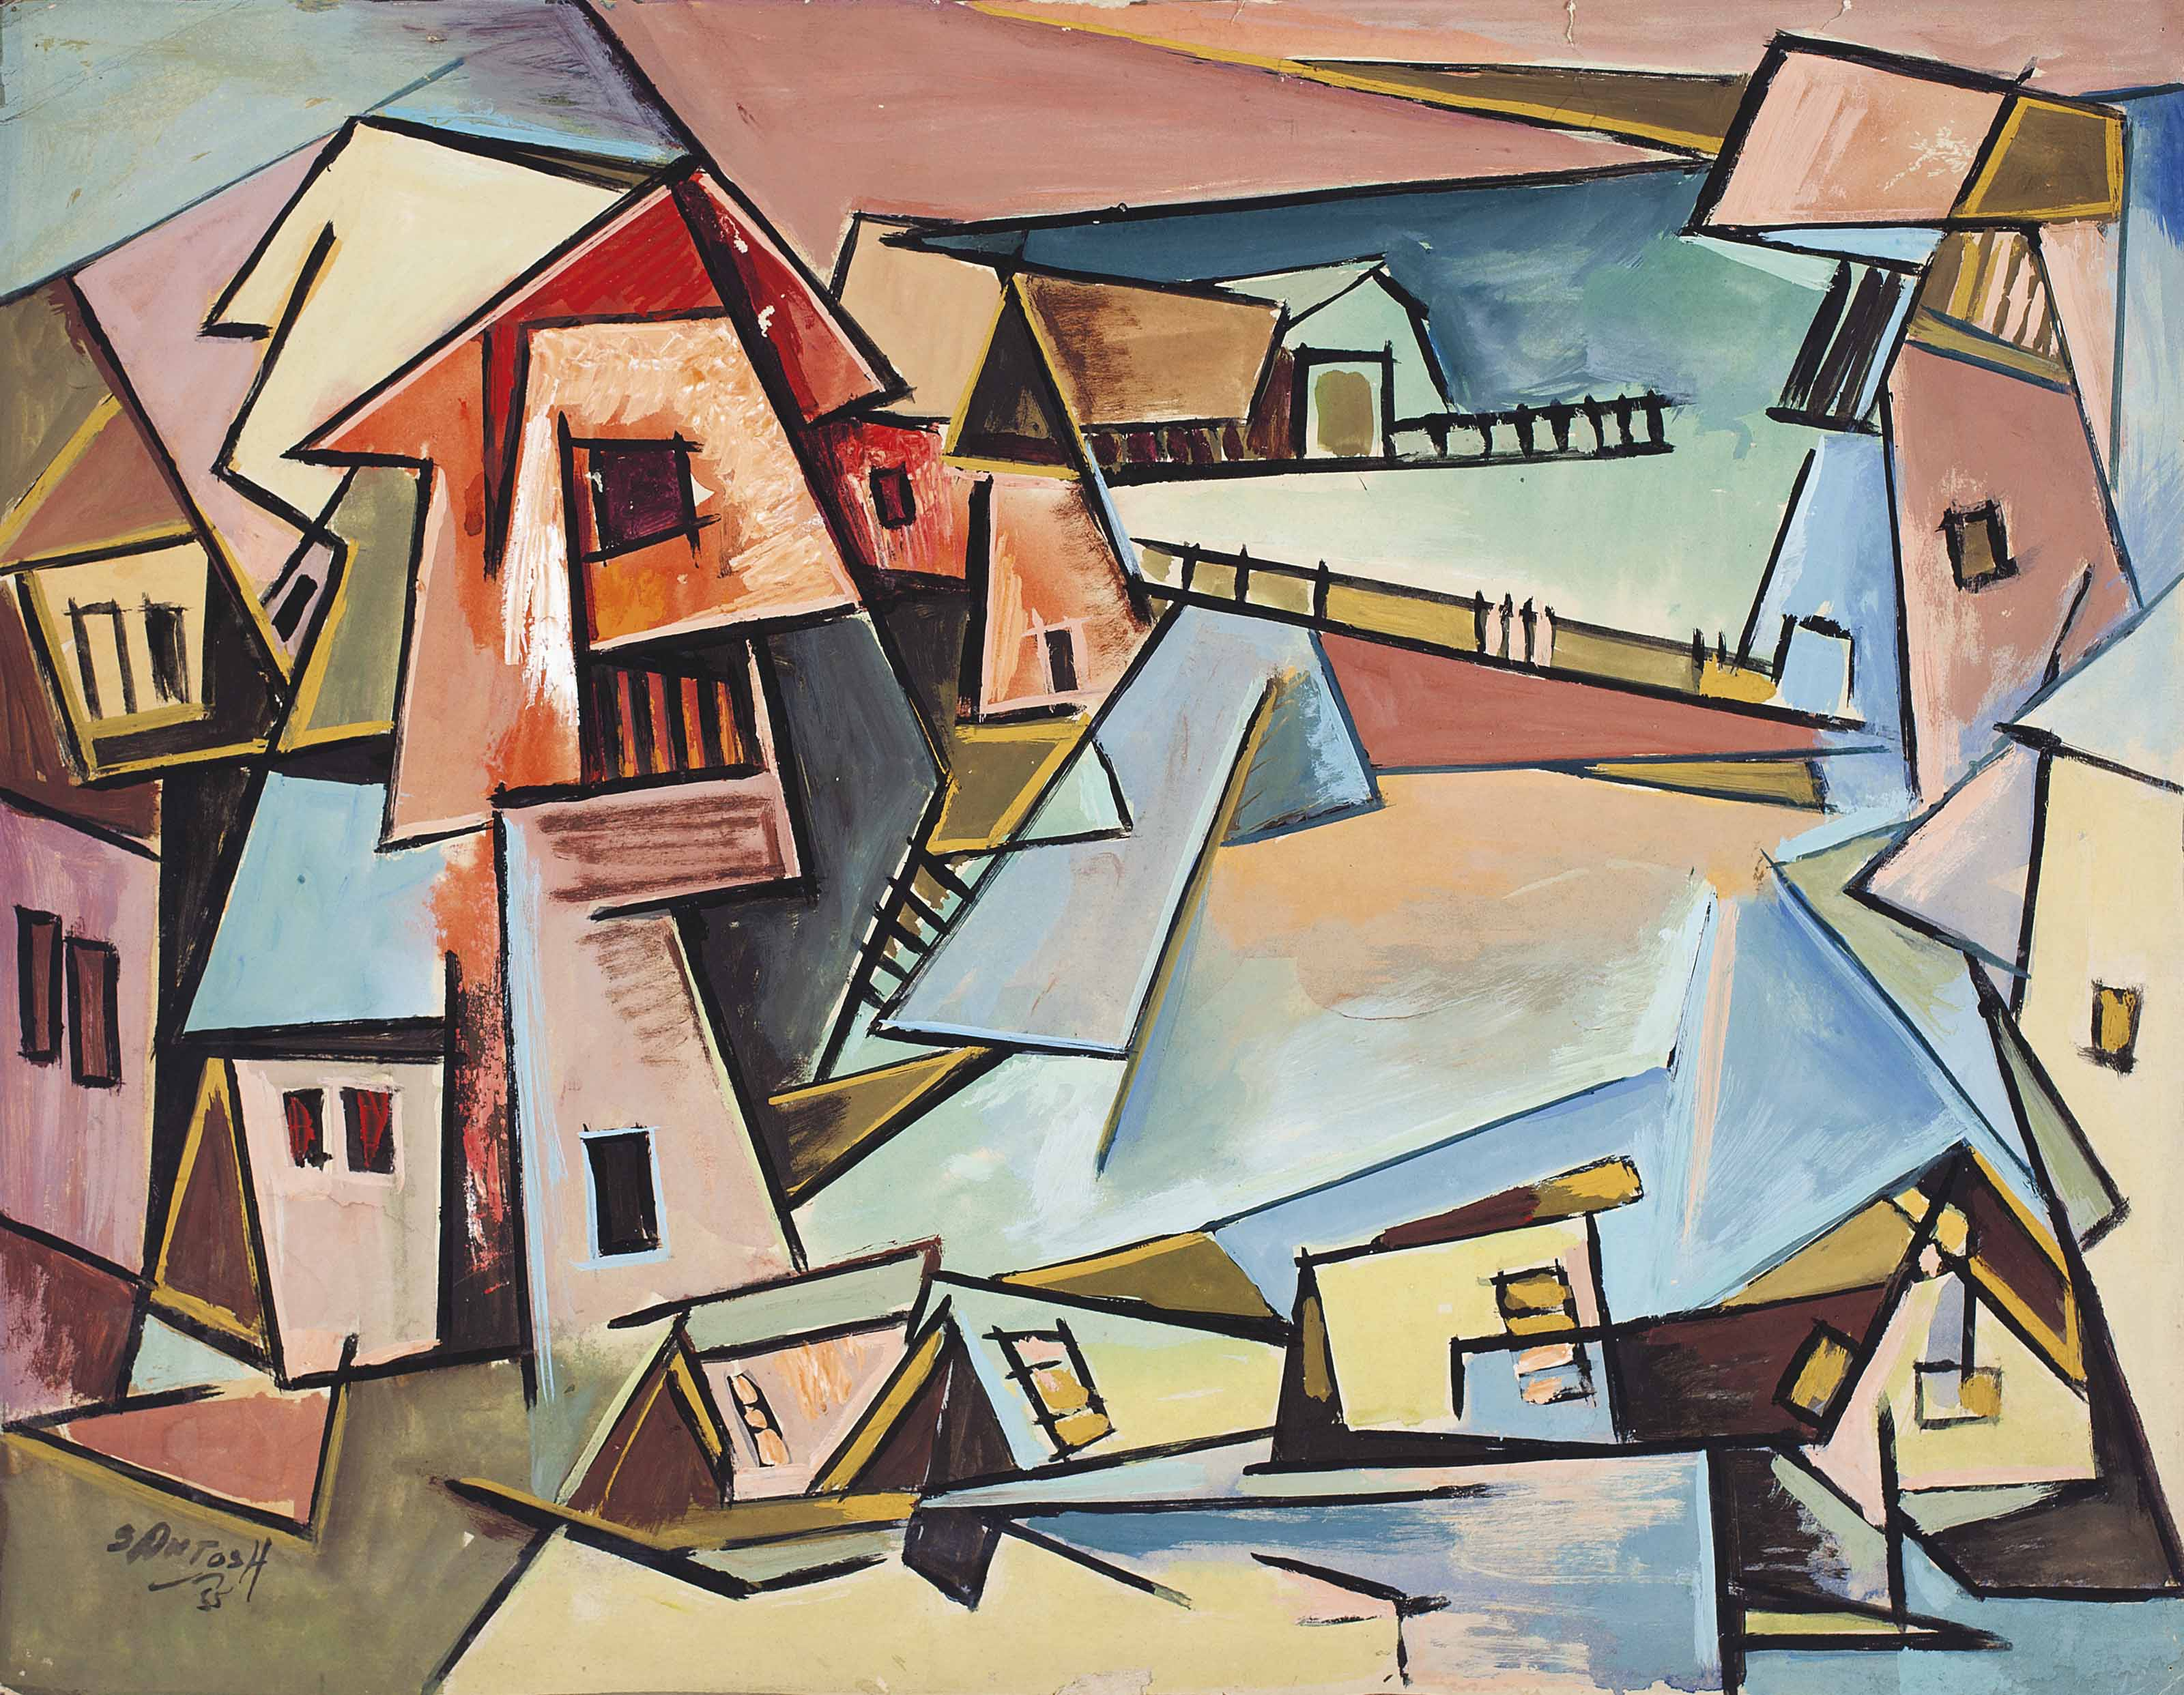 GULAM RASOOL SANTOSH (1929-199